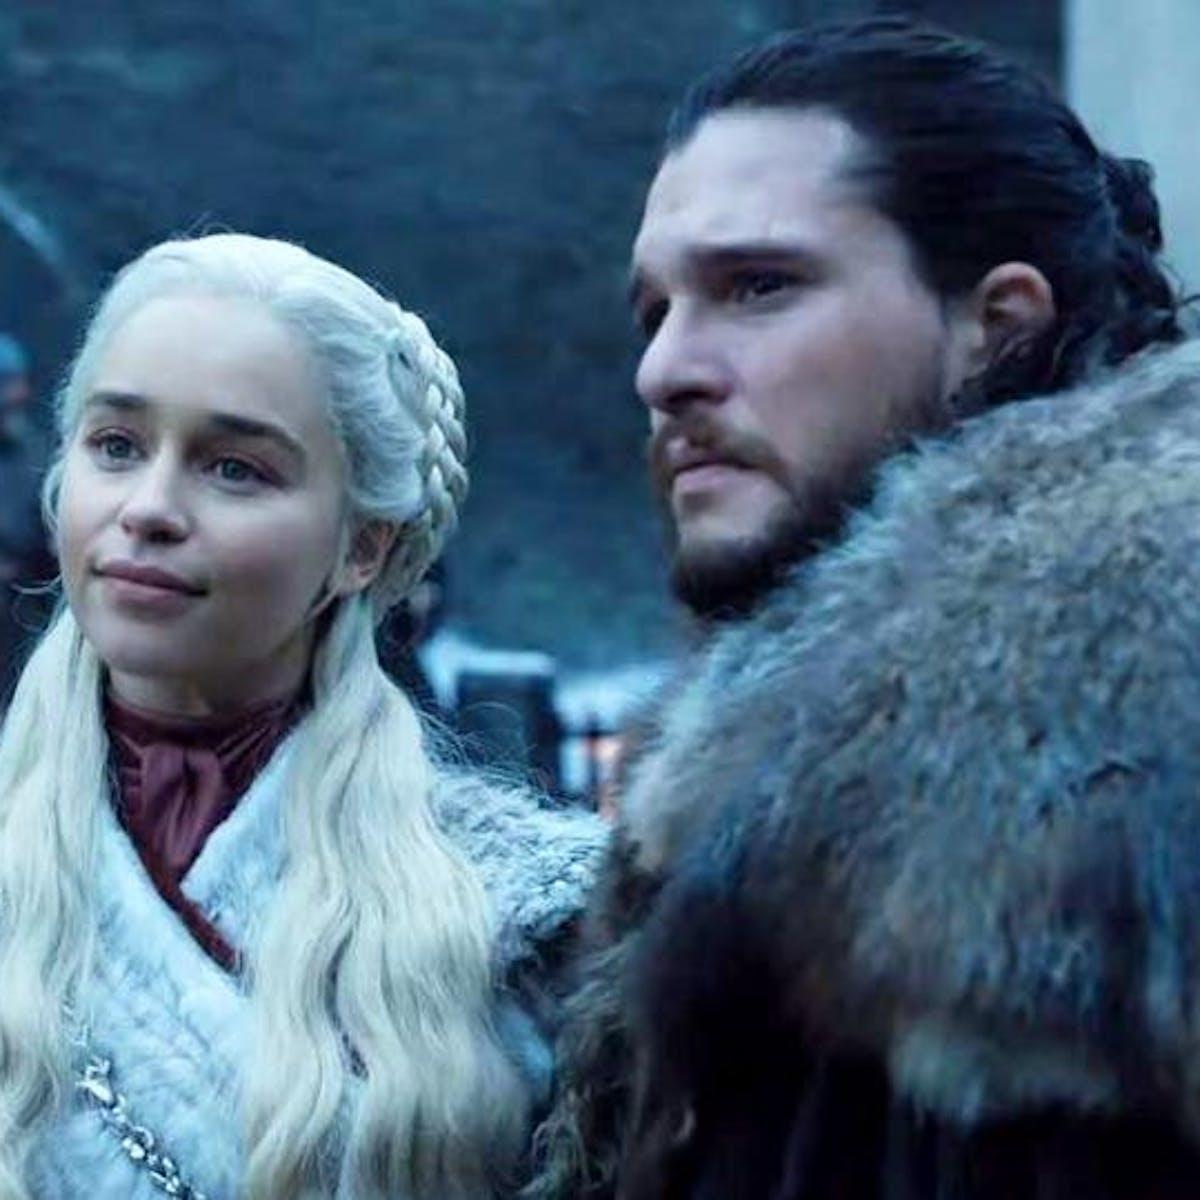 Game of Thrones' Season 8, Episode 2 Title Leak Spells